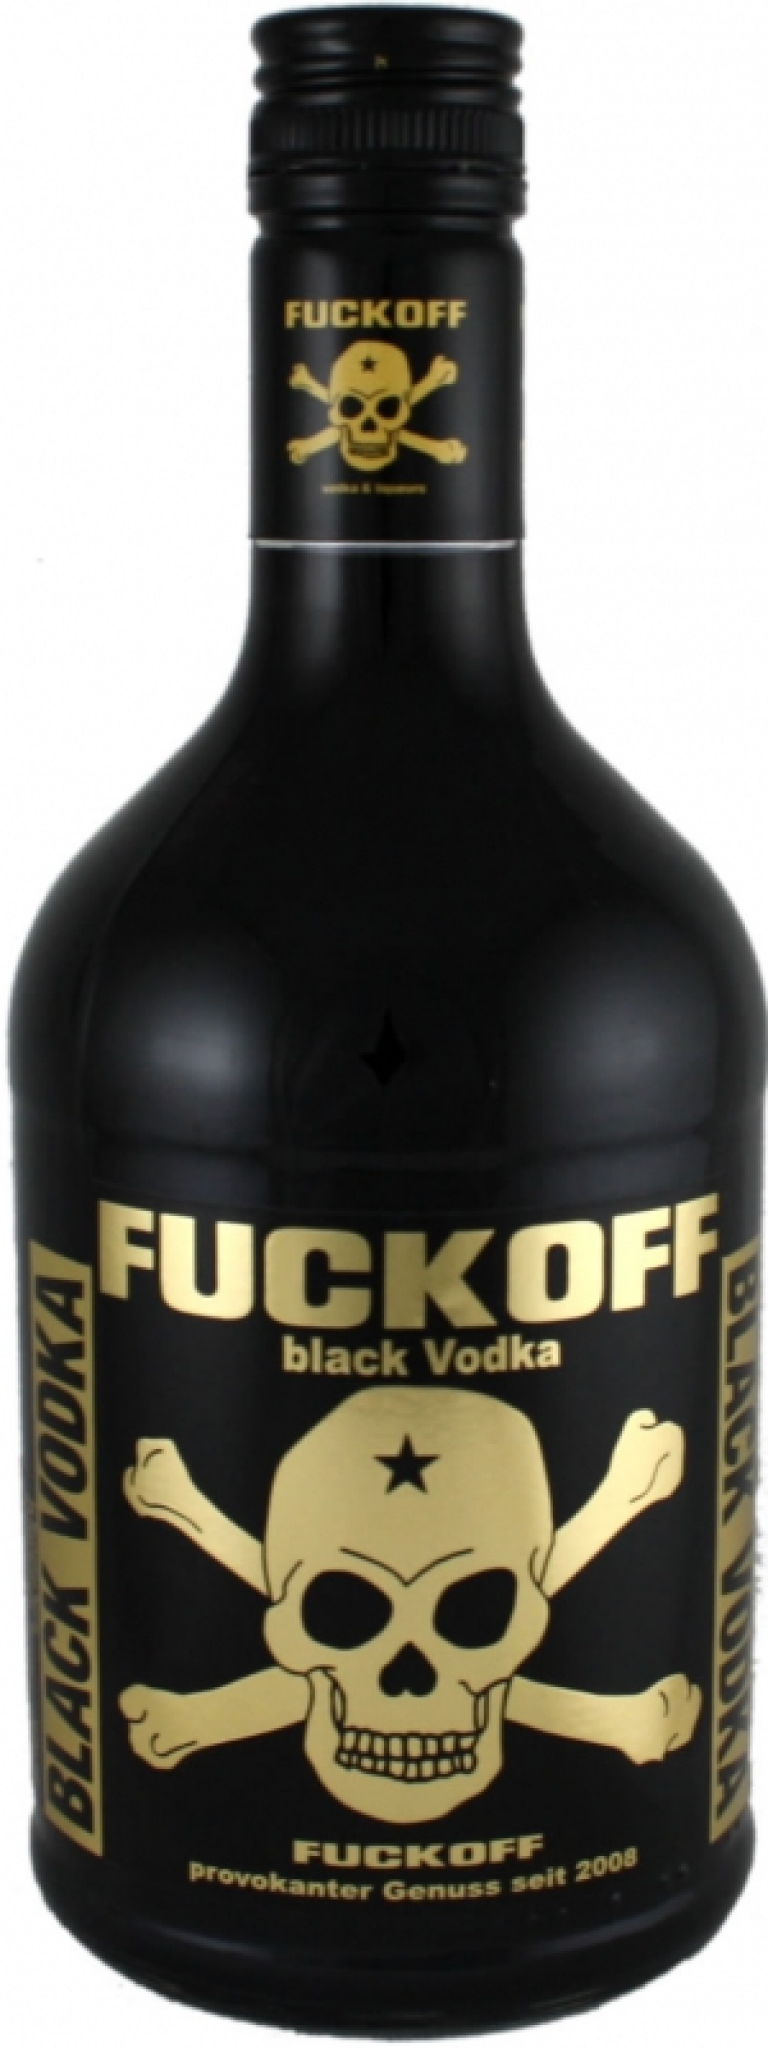 Limp bizkit korn eminem fuck off